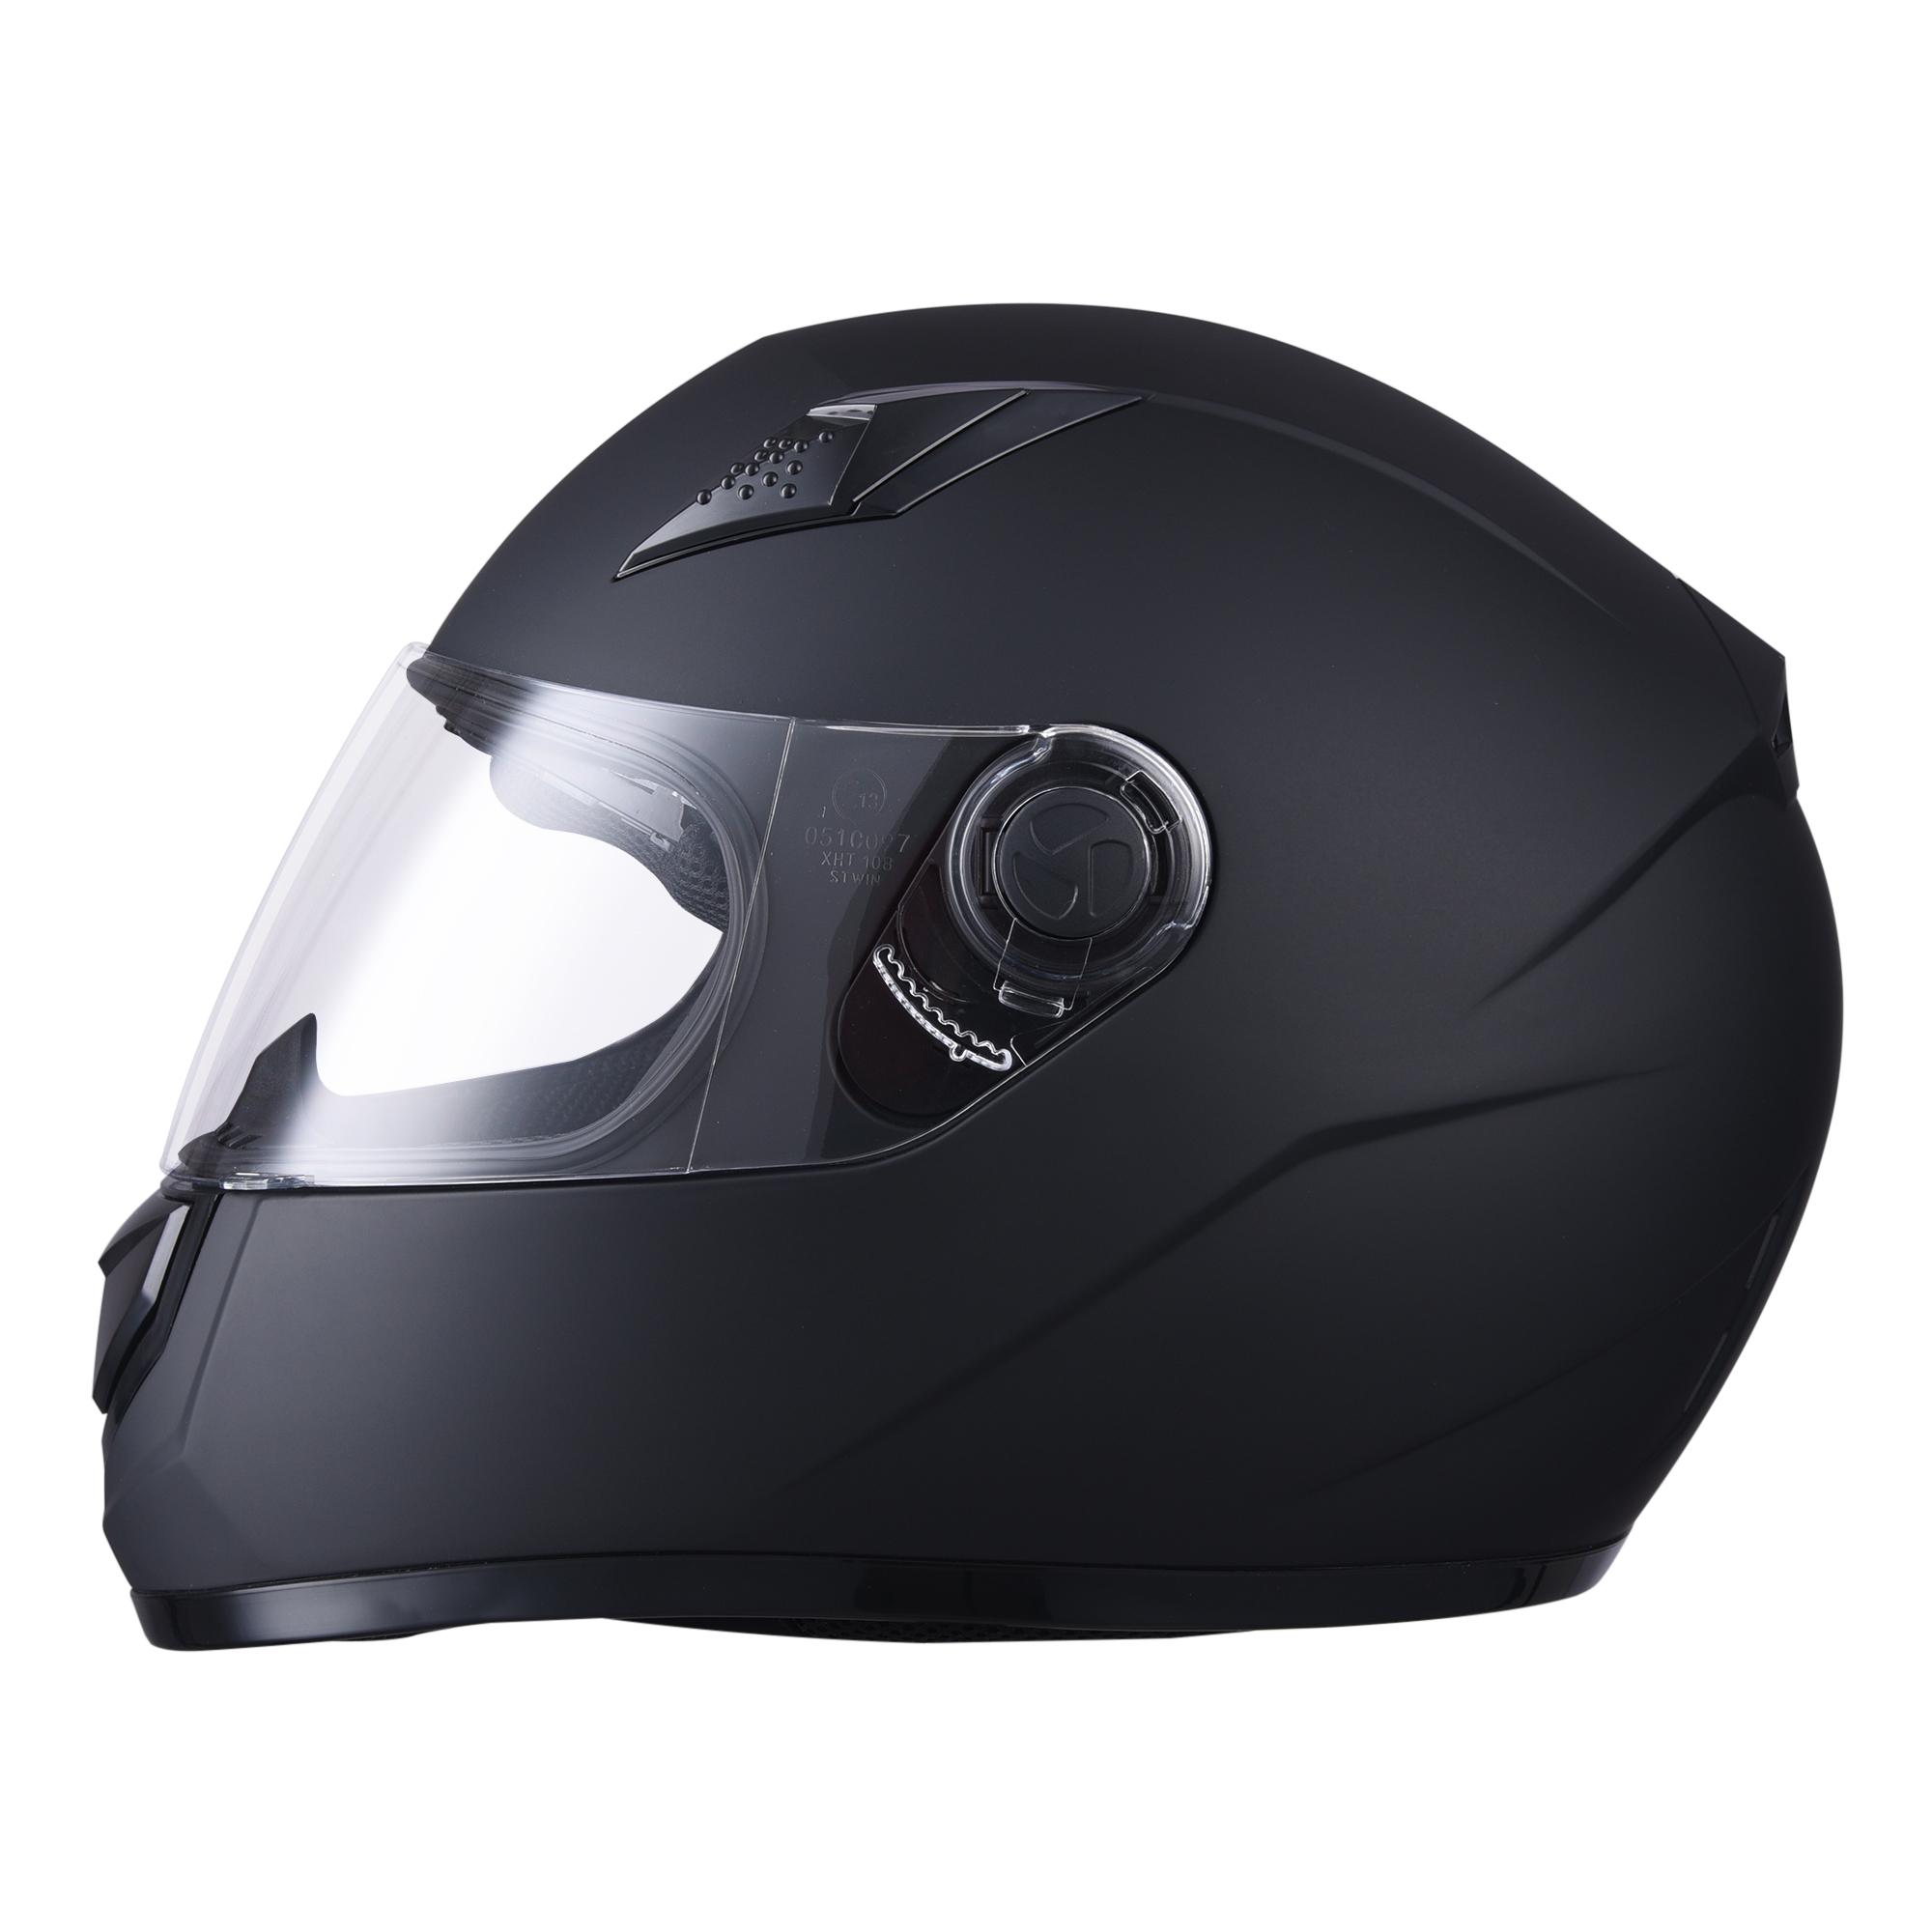 miniature 134 - AHR K12 Full Face Motorcycle Helmet DOT Air Vents Clear Visor Racing S M L XL